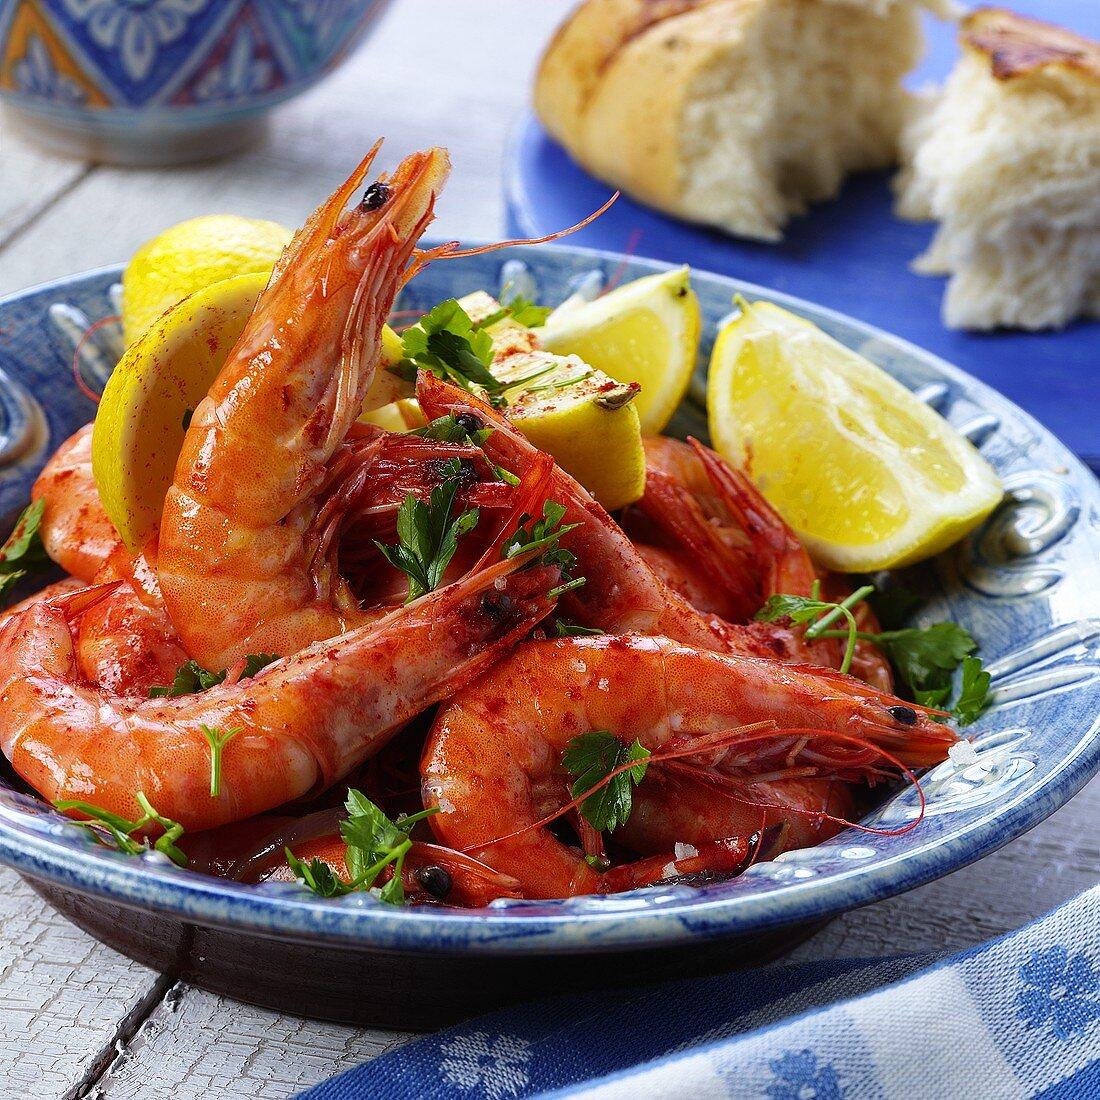 Jumbo prawns with lemons and white bread